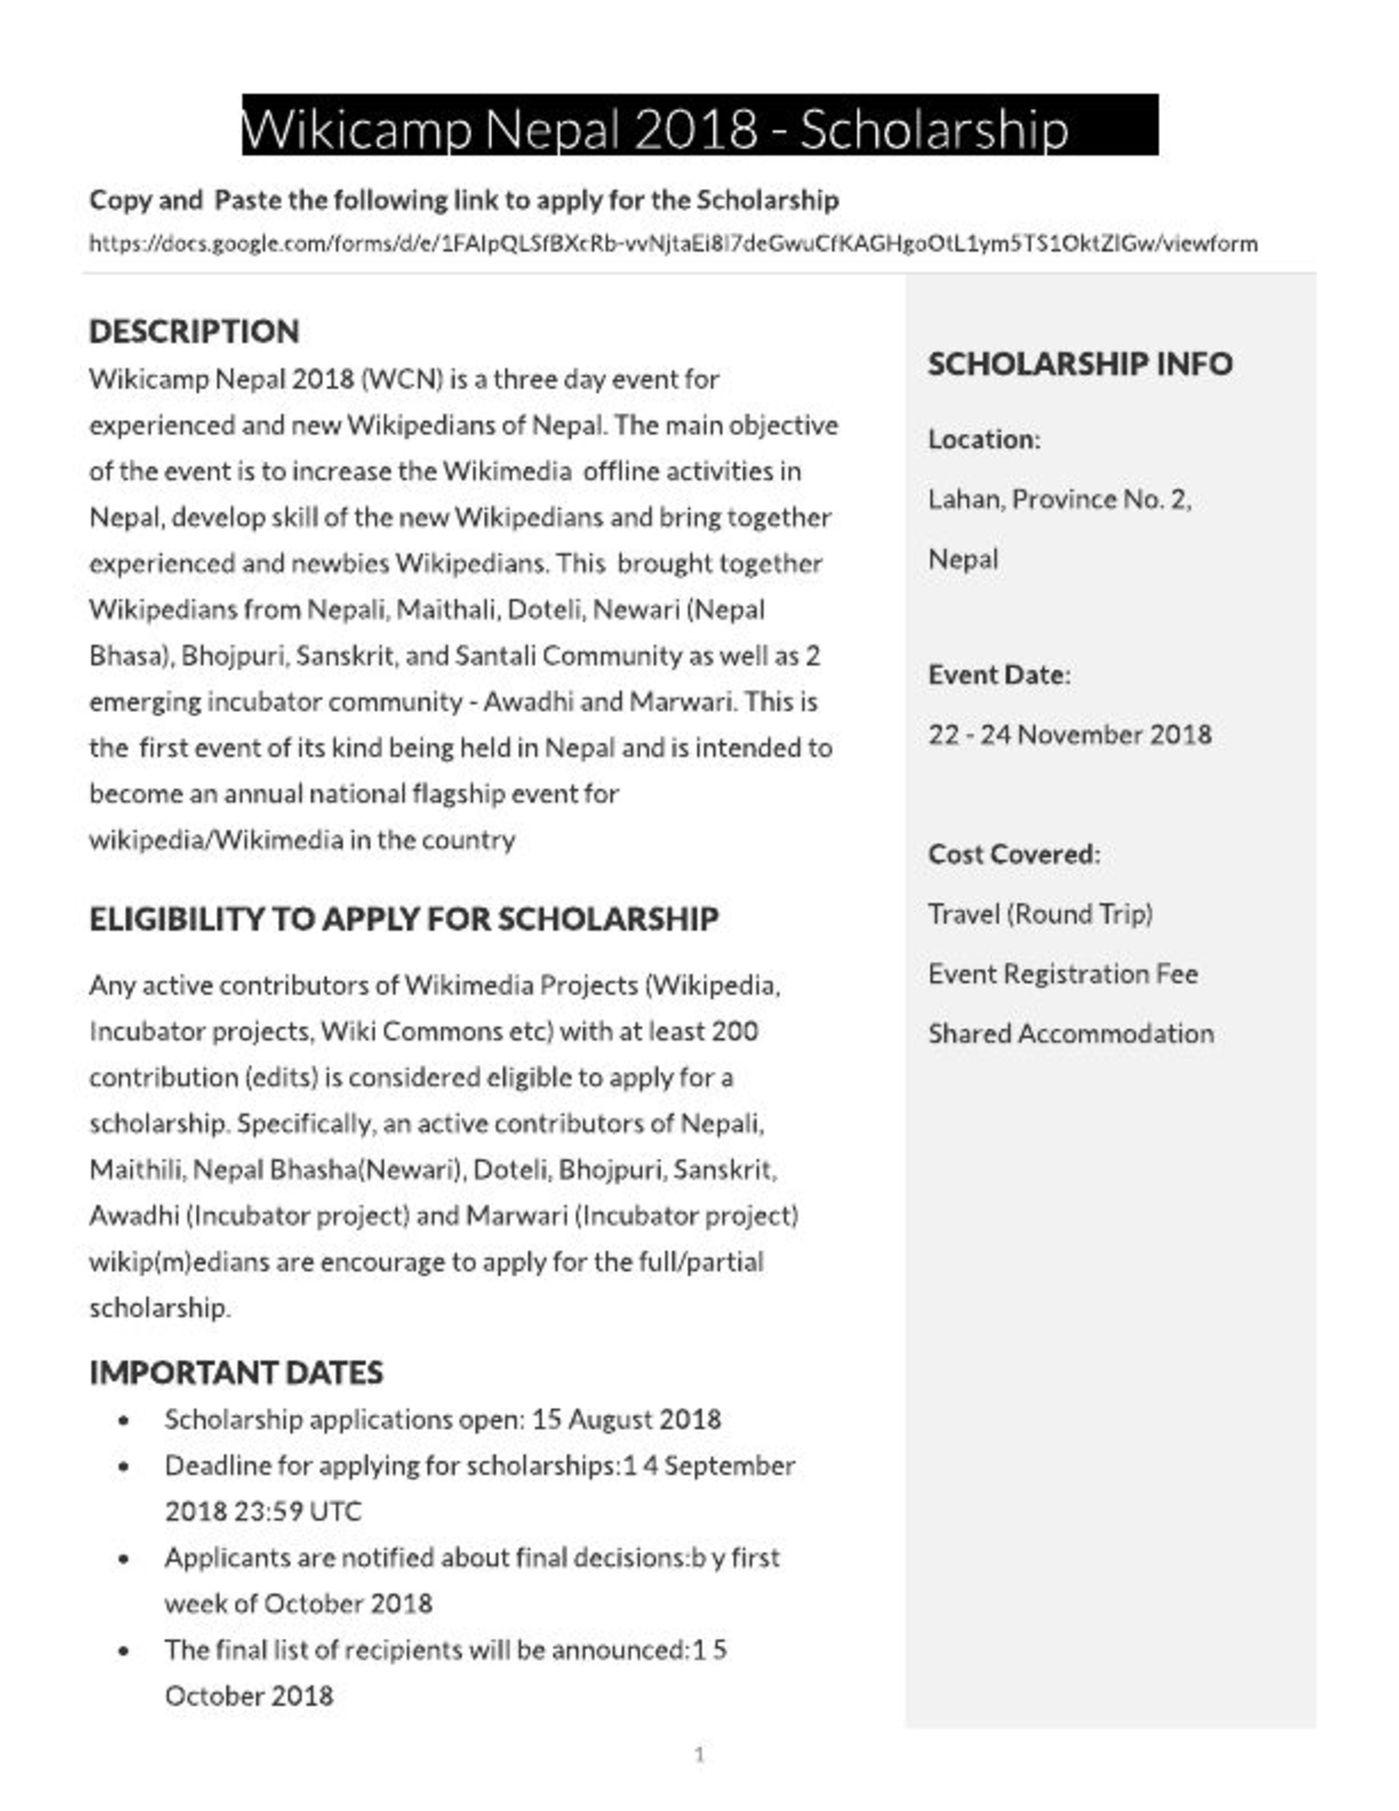 Scholarship - Wikicamp Nepal 2018